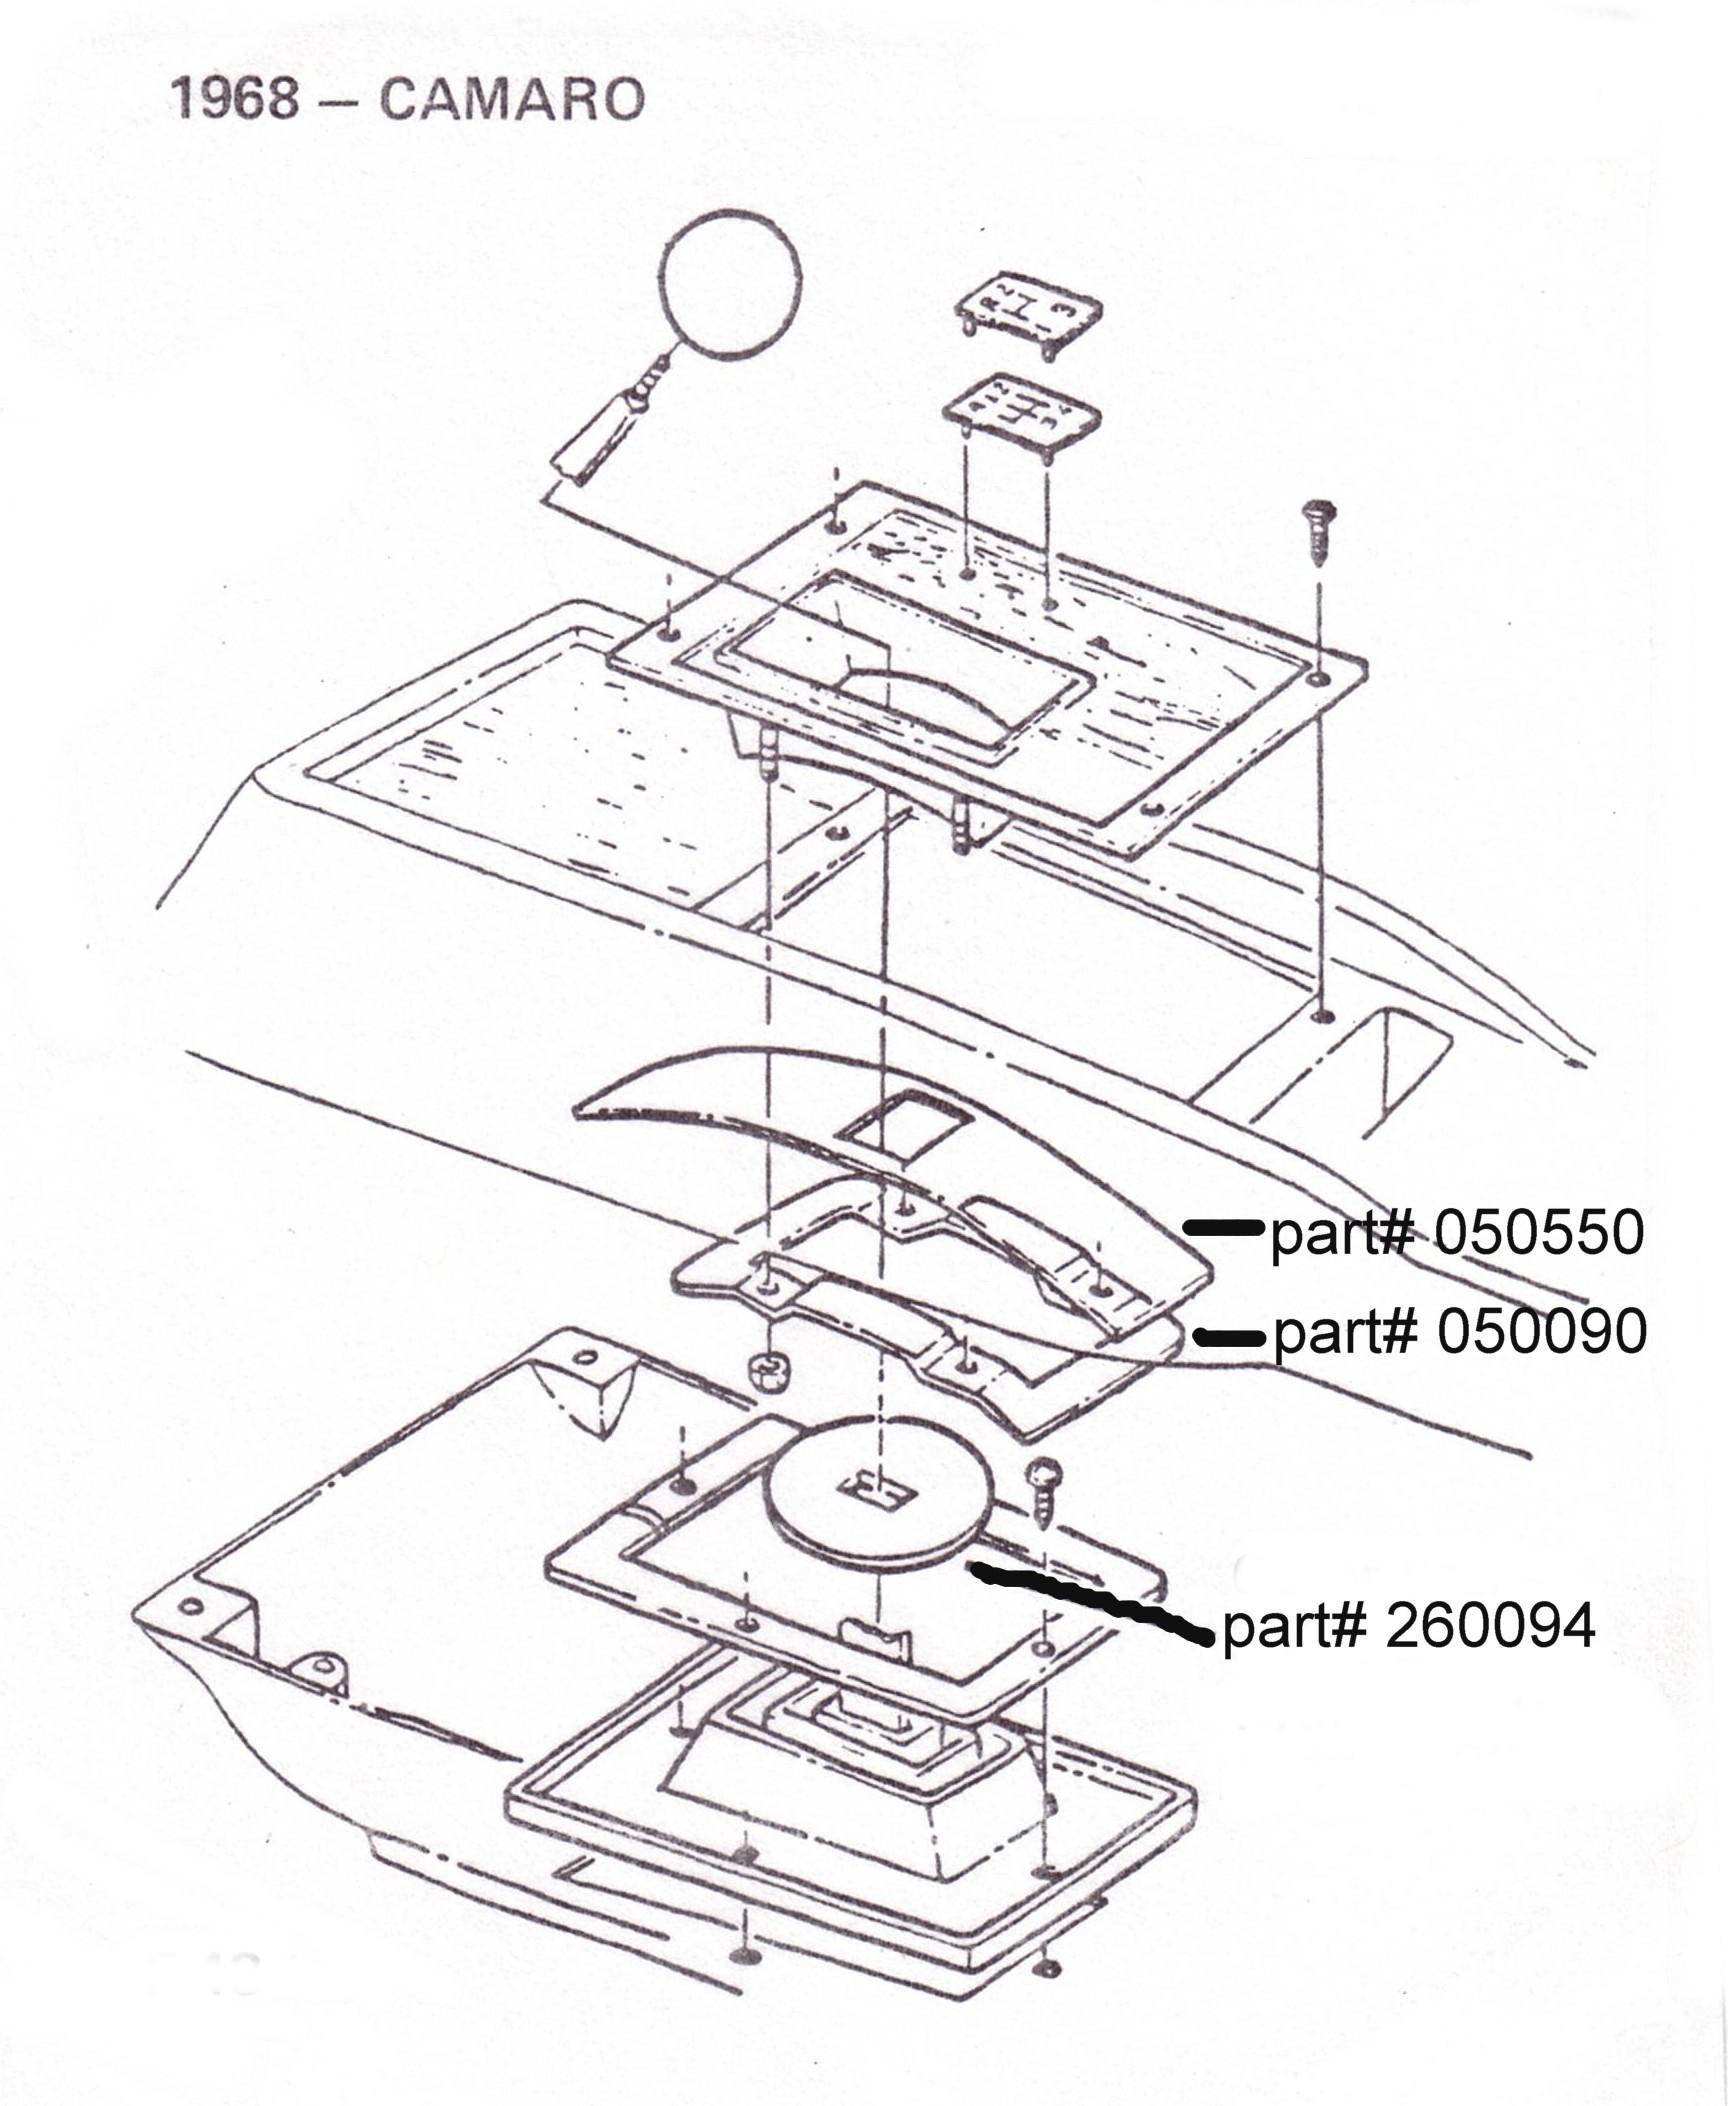 1728x2106 68 Camaro, Shifter Handle Seal, 4 Speed Upper Seal